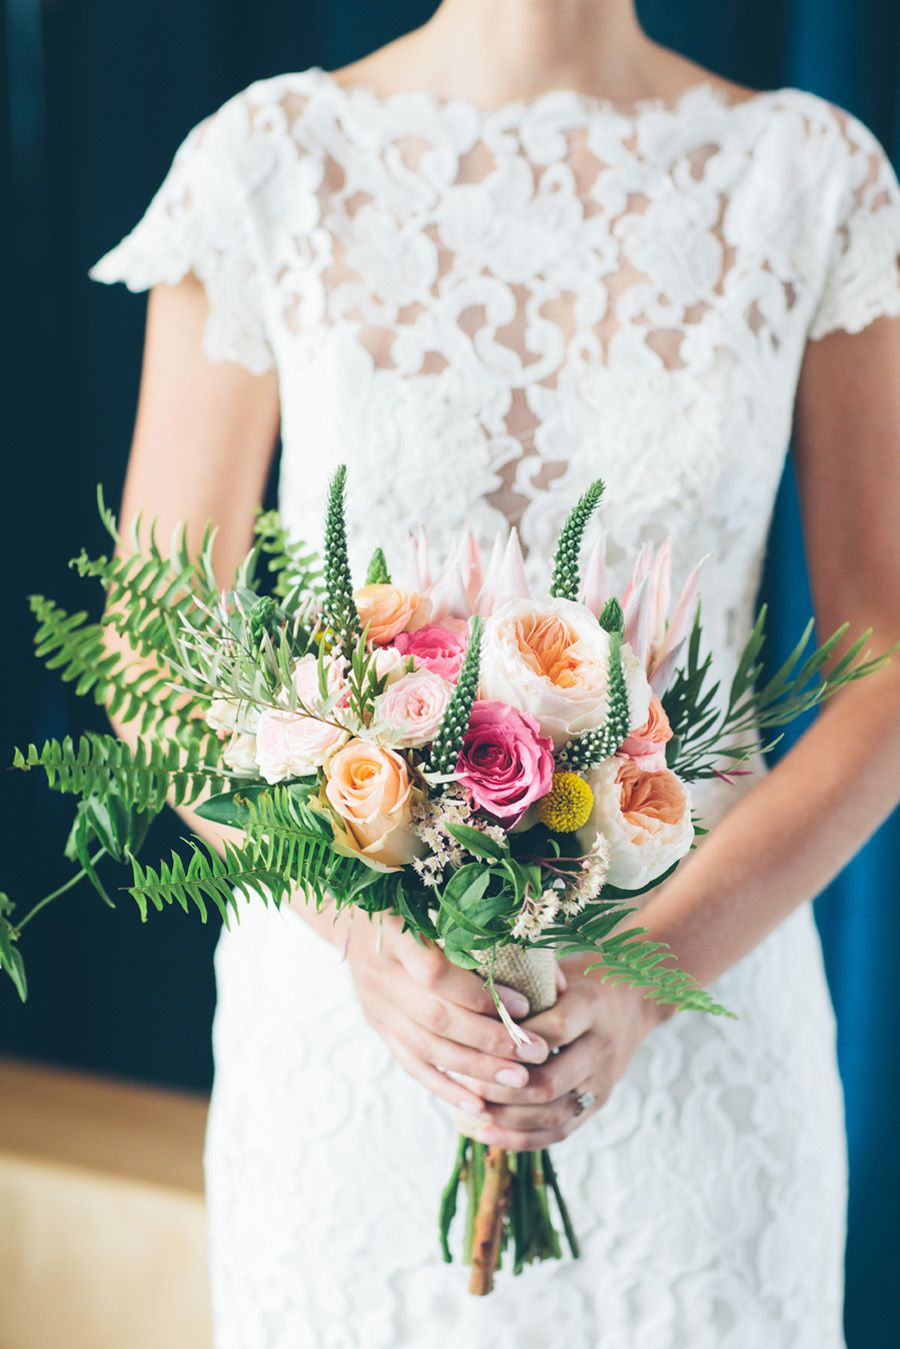 Lovely peaches + greens   Photography: Cynthia Chung Weddings - cynthiachungweddings.com